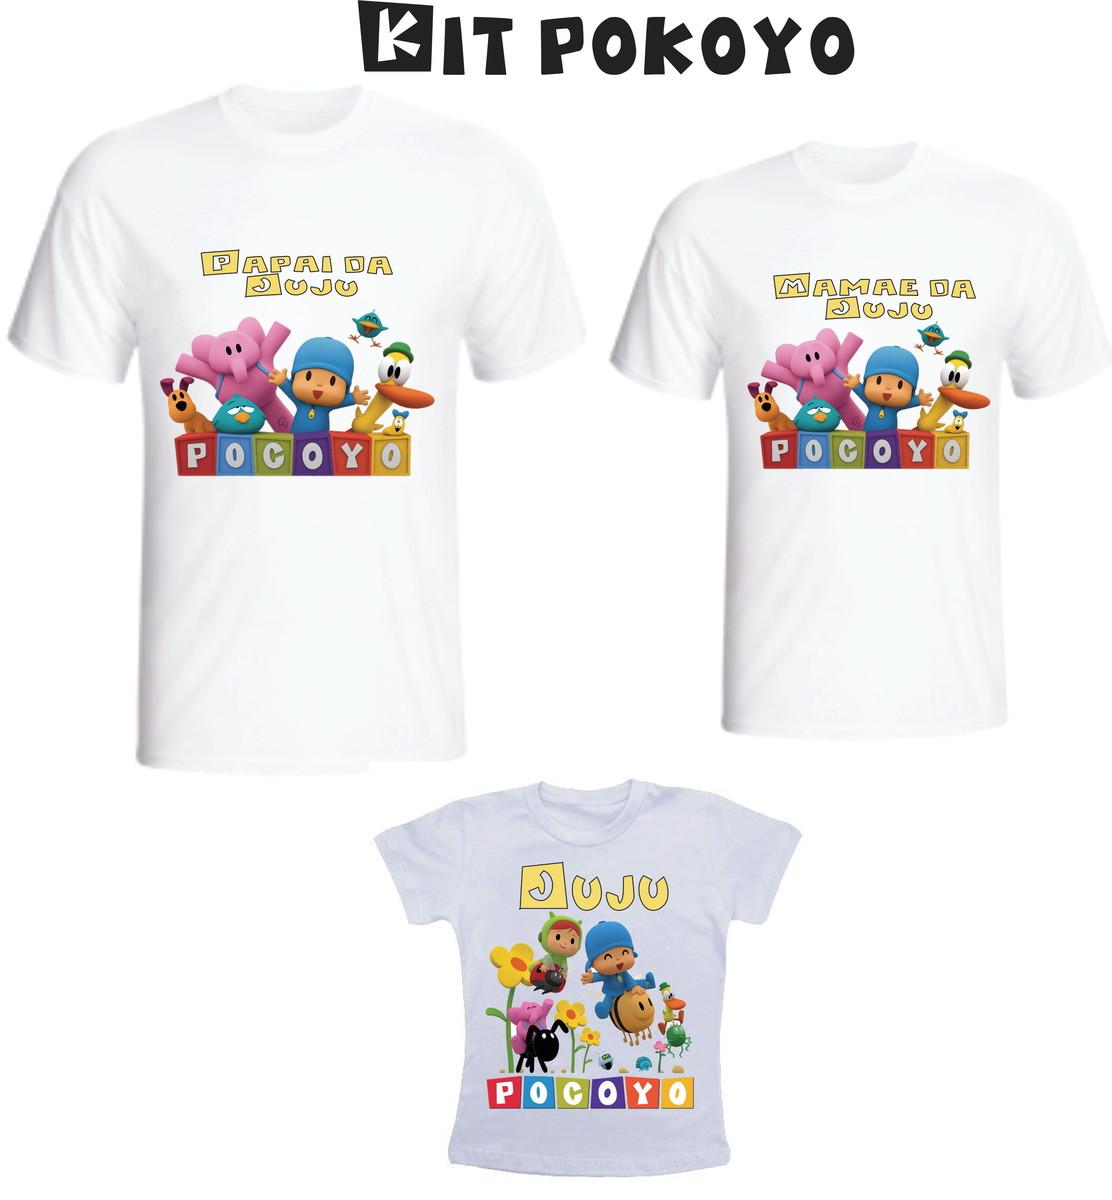 Camiseta Pocoyo Kit  03 camisetas - Personalizada no Elo7  c6f25d3c94929